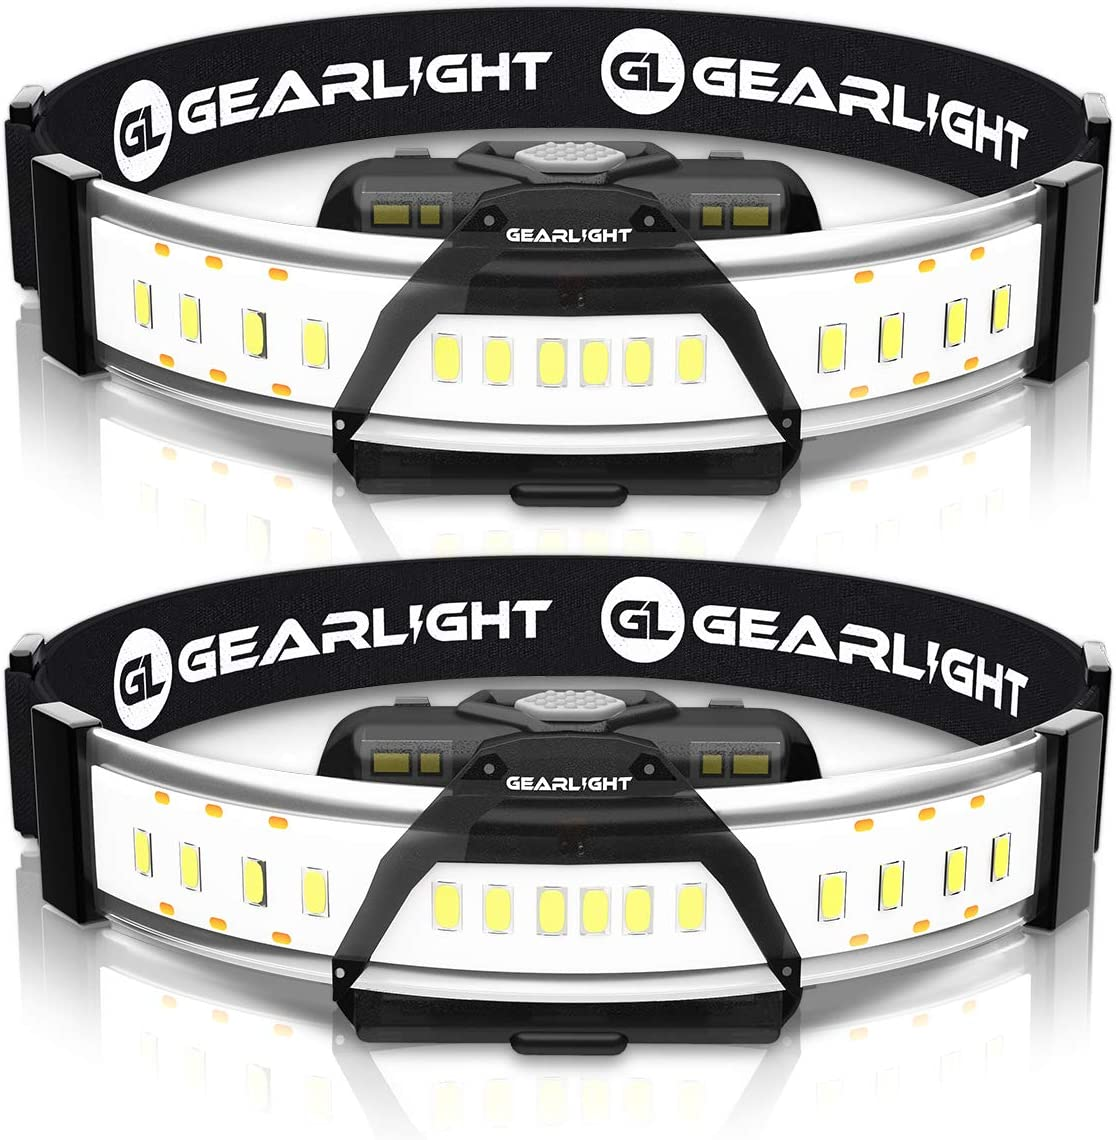 GearLight 180° Broad Beam LED Headlamp Flashlight F300 [2 Pack]